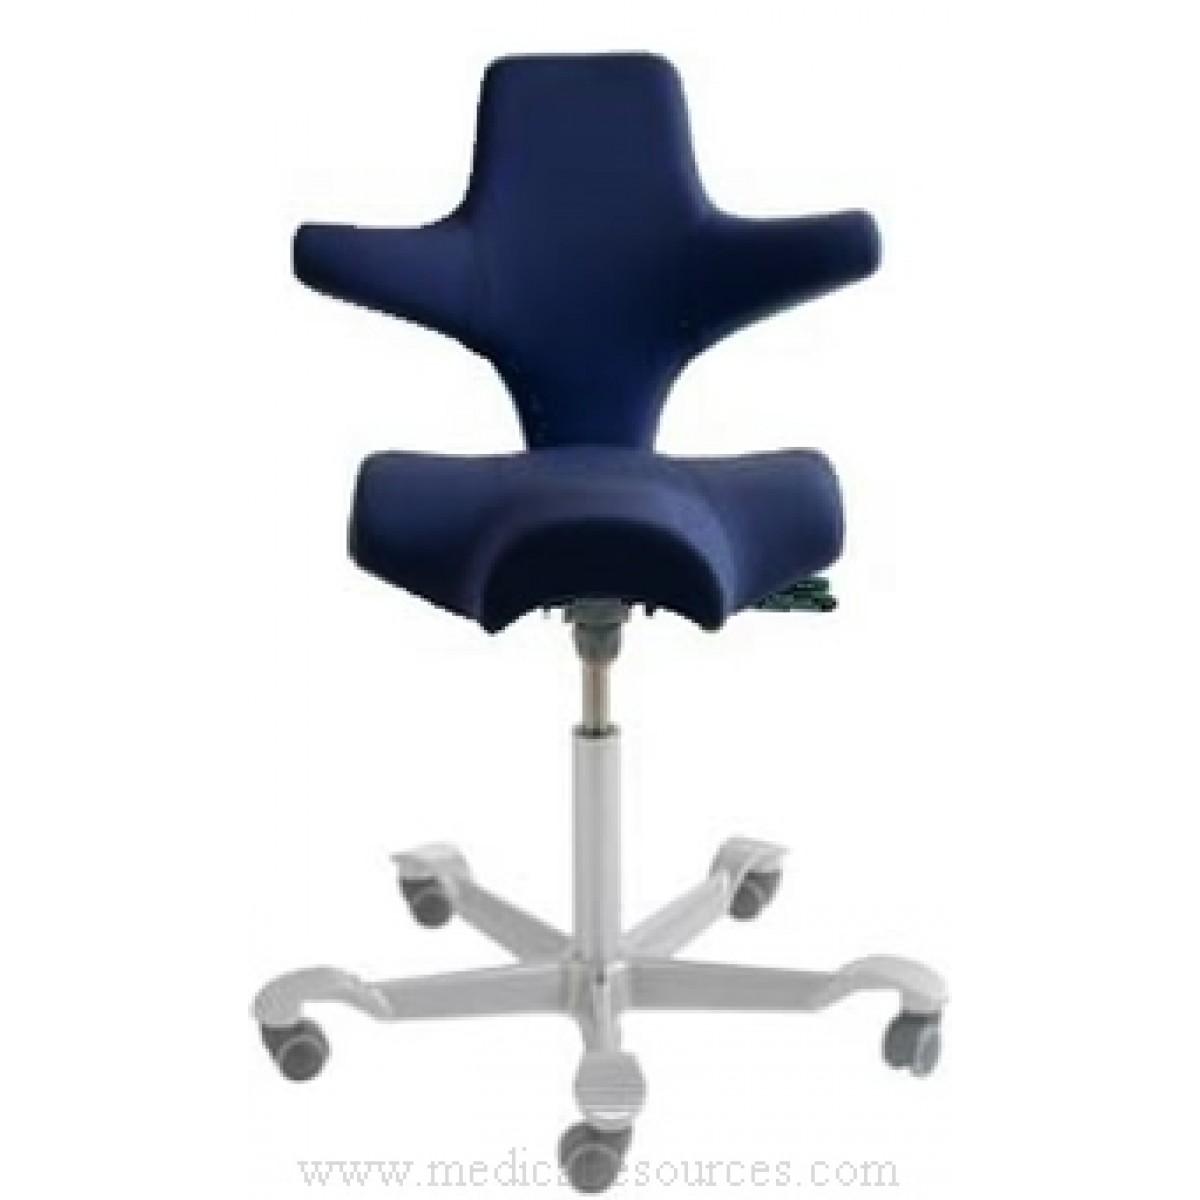 HAG Capisco Saddle Seat with Back Grade 3 Vinyl Seat Height Range16 -21   sc 1 st  Medical Resources & hag_capisco_ergonomic_sonographer_chair islam-shia.org